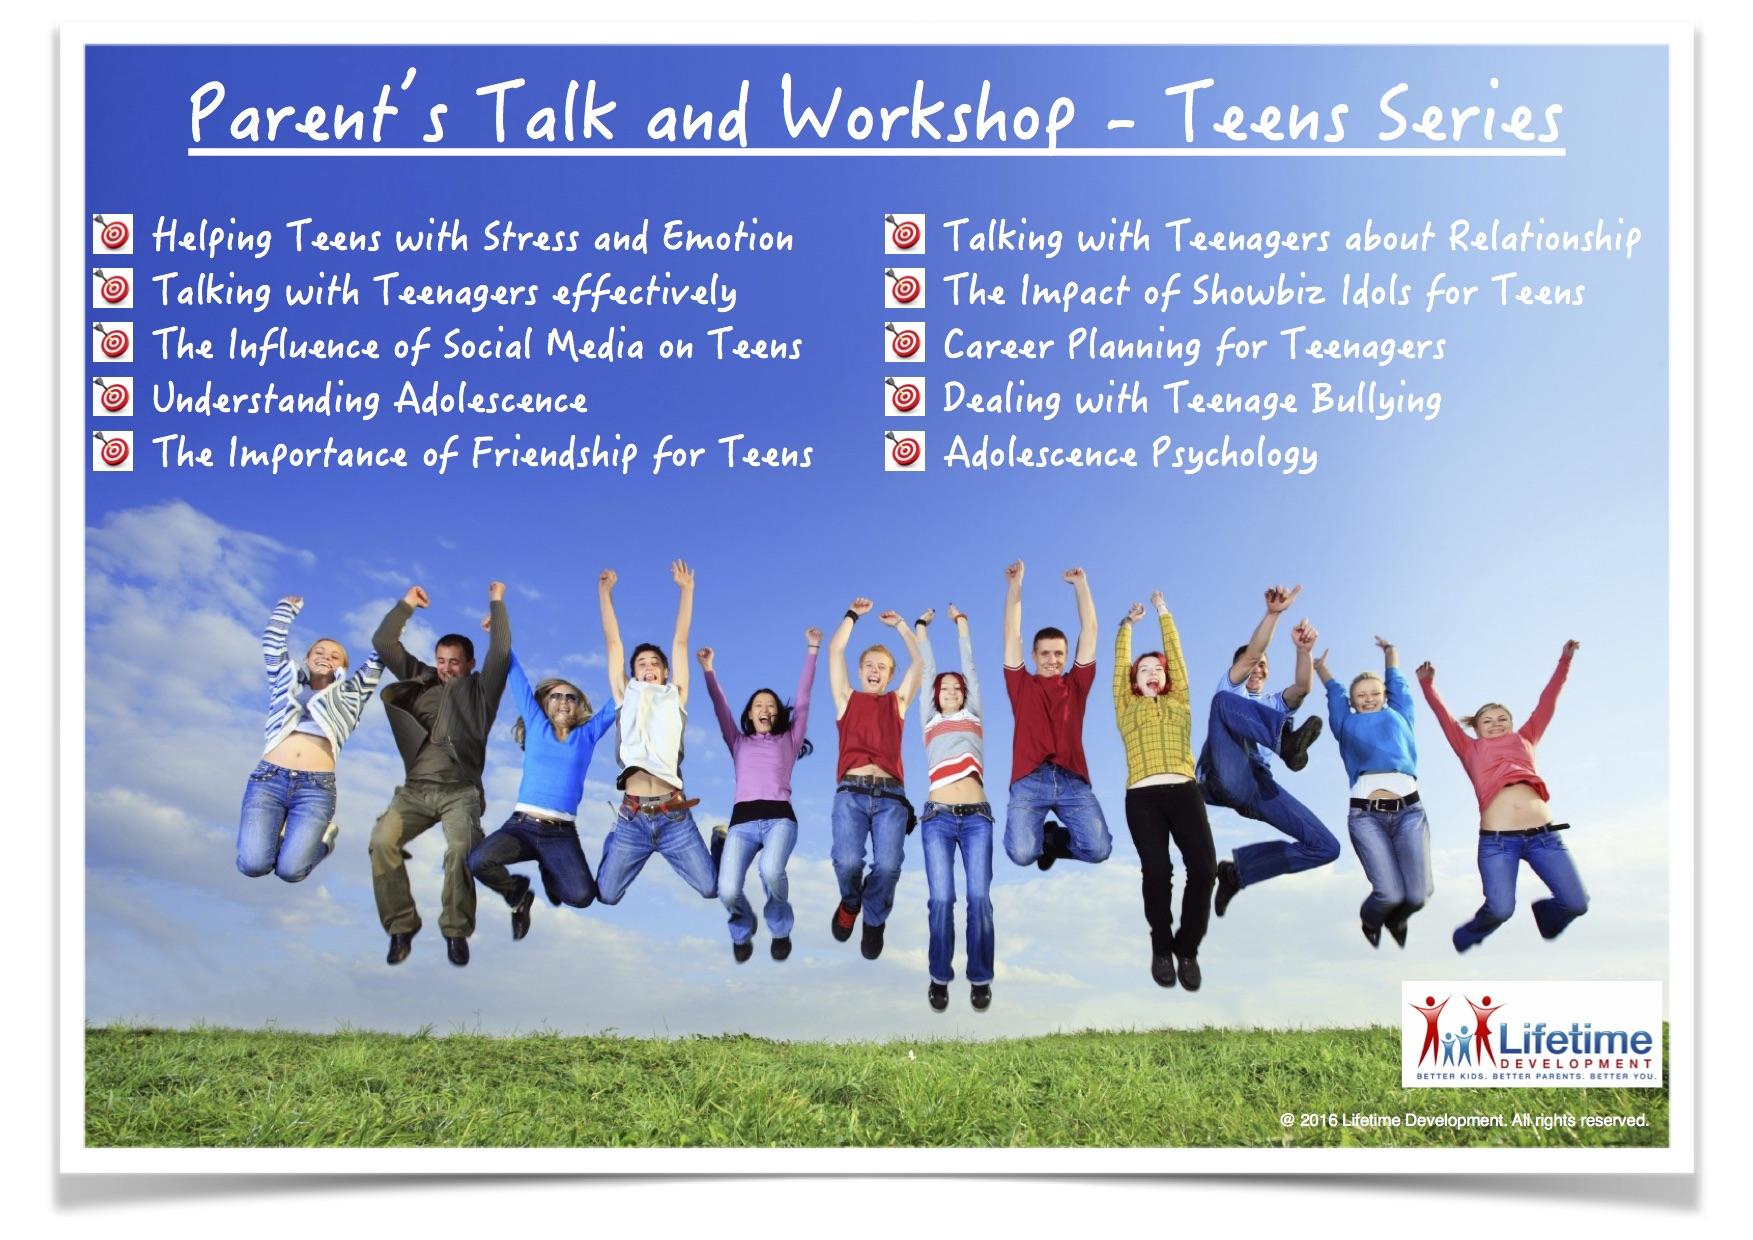 201607 Parent Talk and Workshop Teens Series English